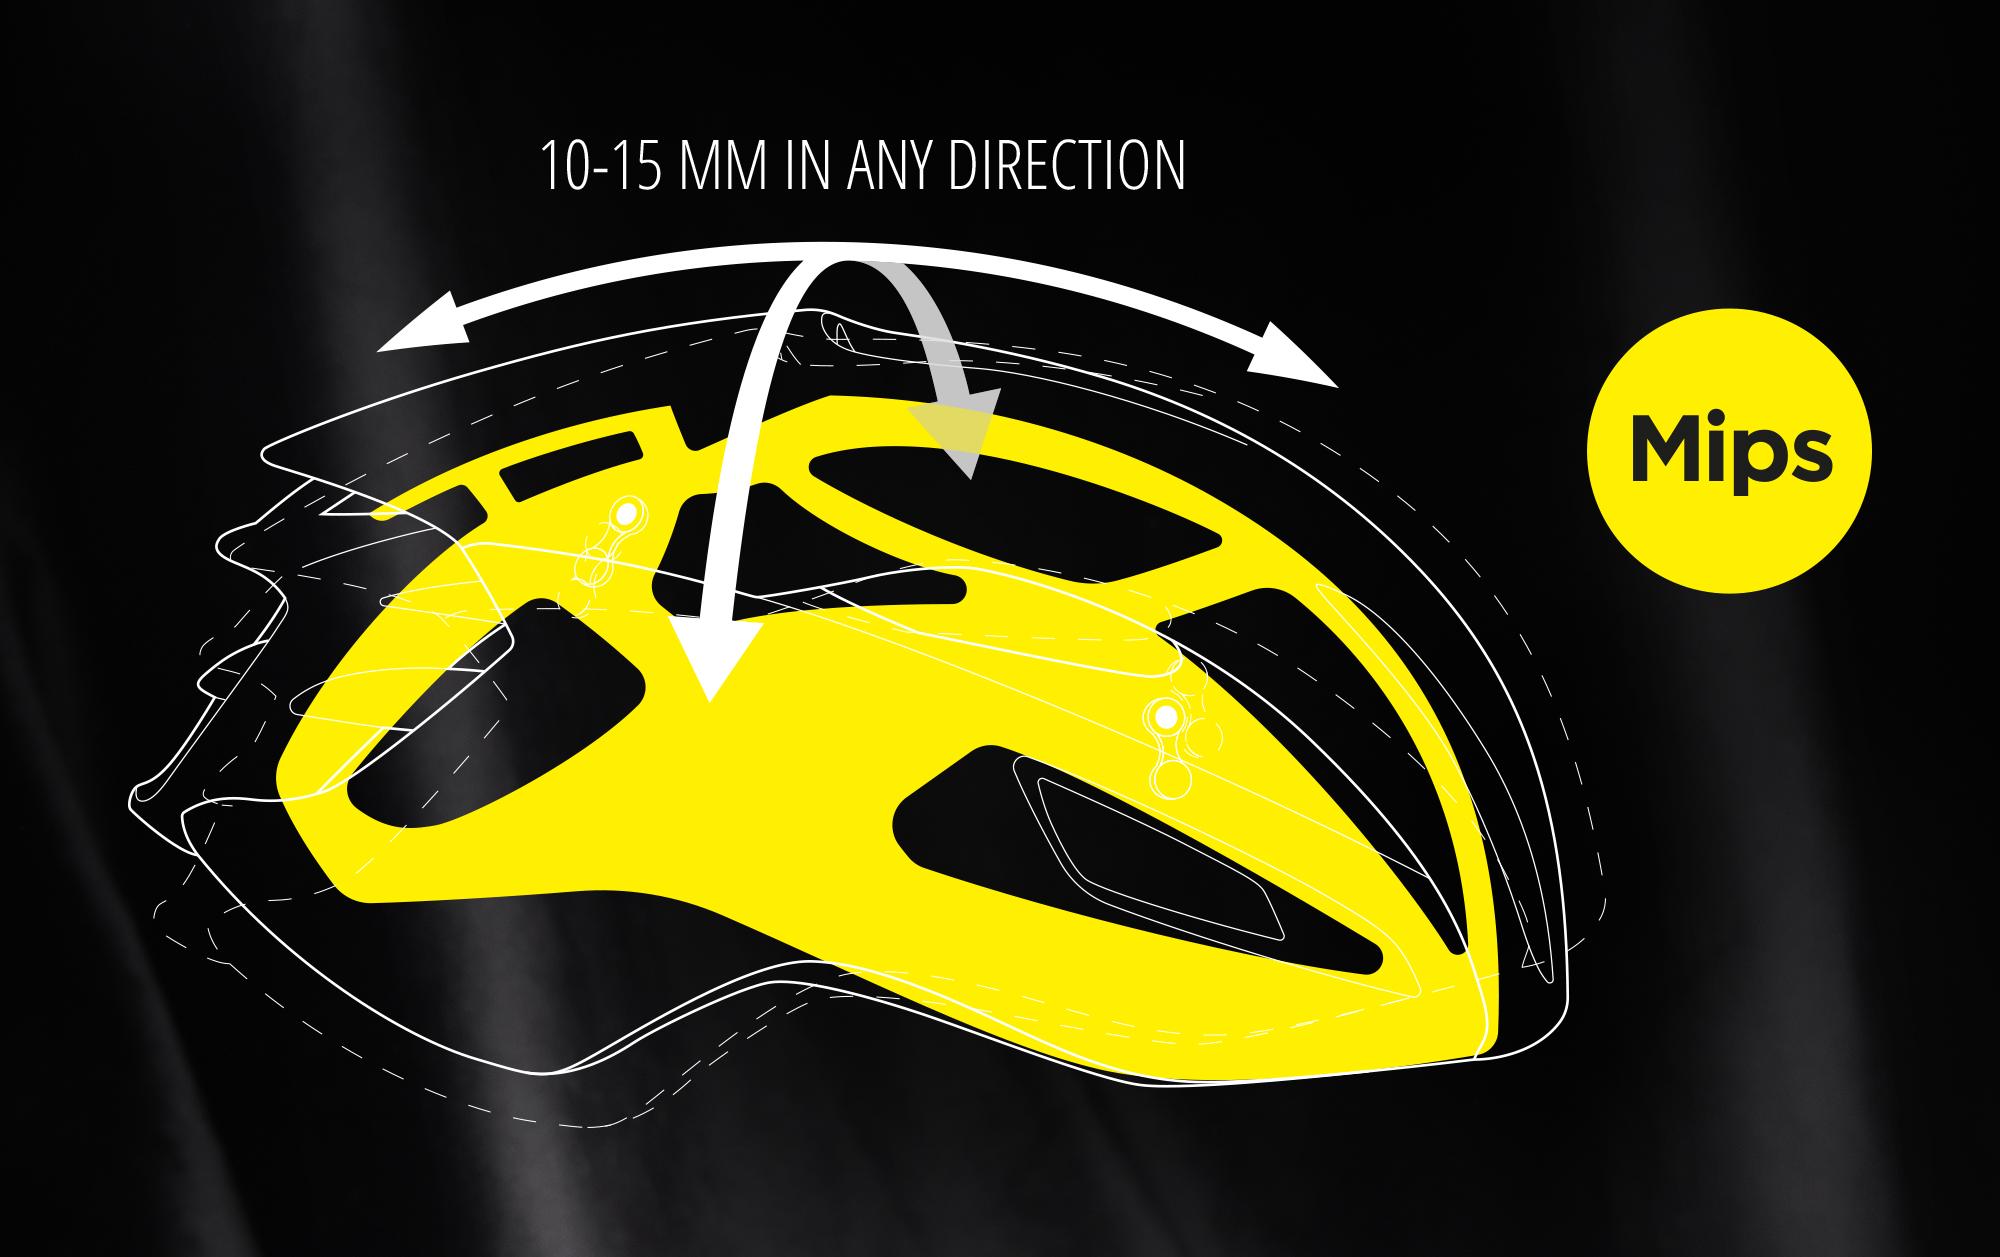 MET Manta Mips Road, Triathlon and Winter Rides Helmet: Brain Protection System